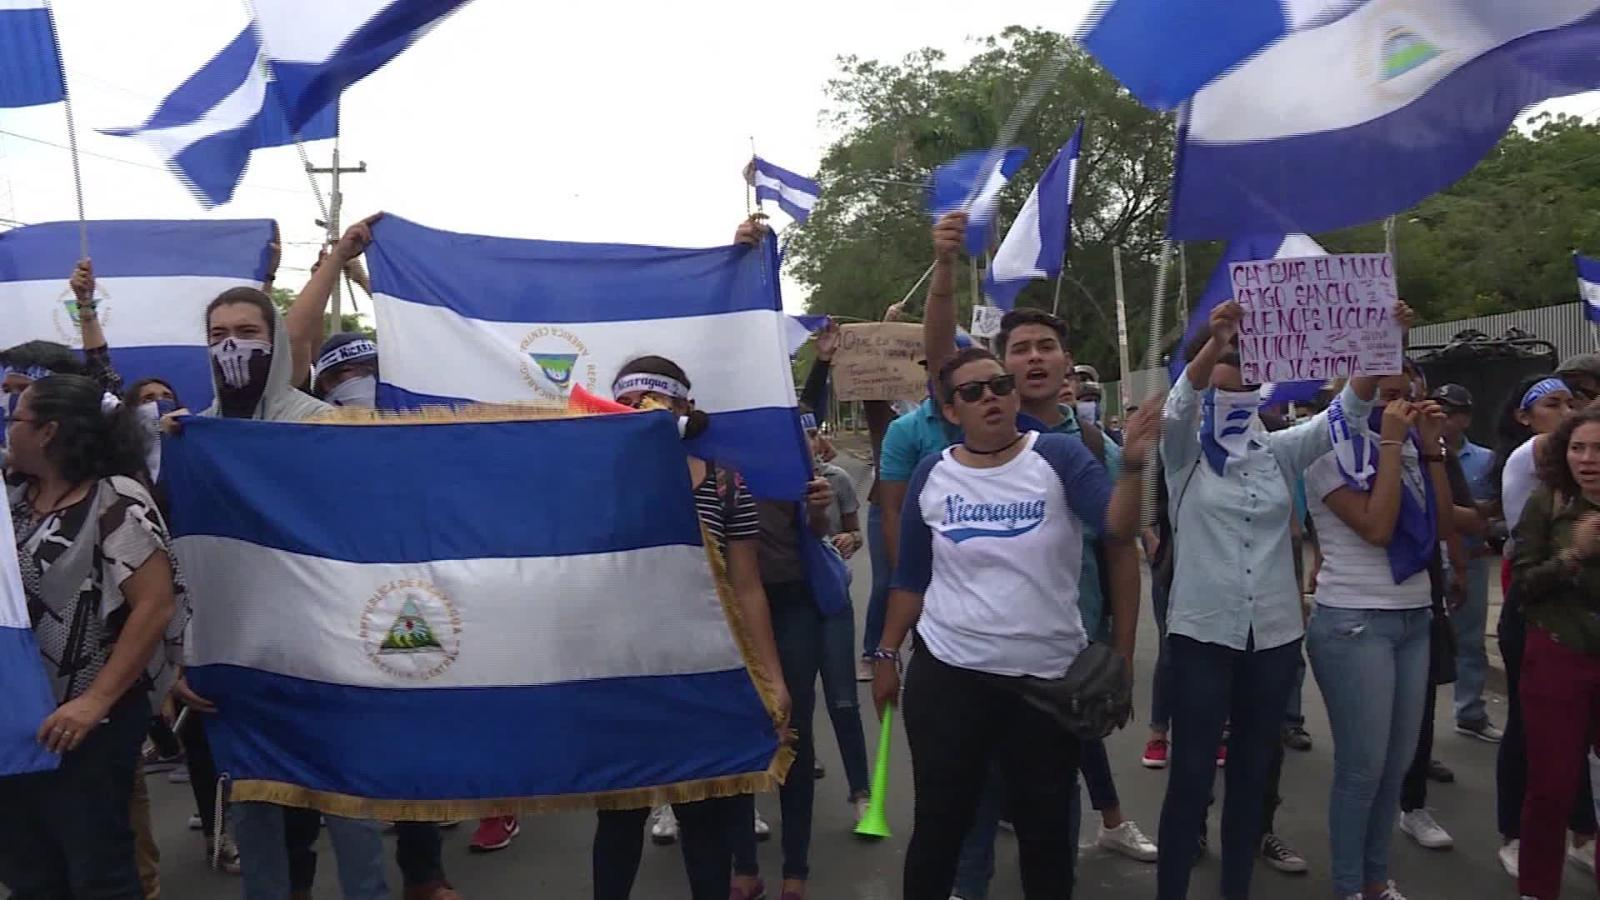 Ordena gobierno de Nicaragua expulsar a comitiva de DH de ONU